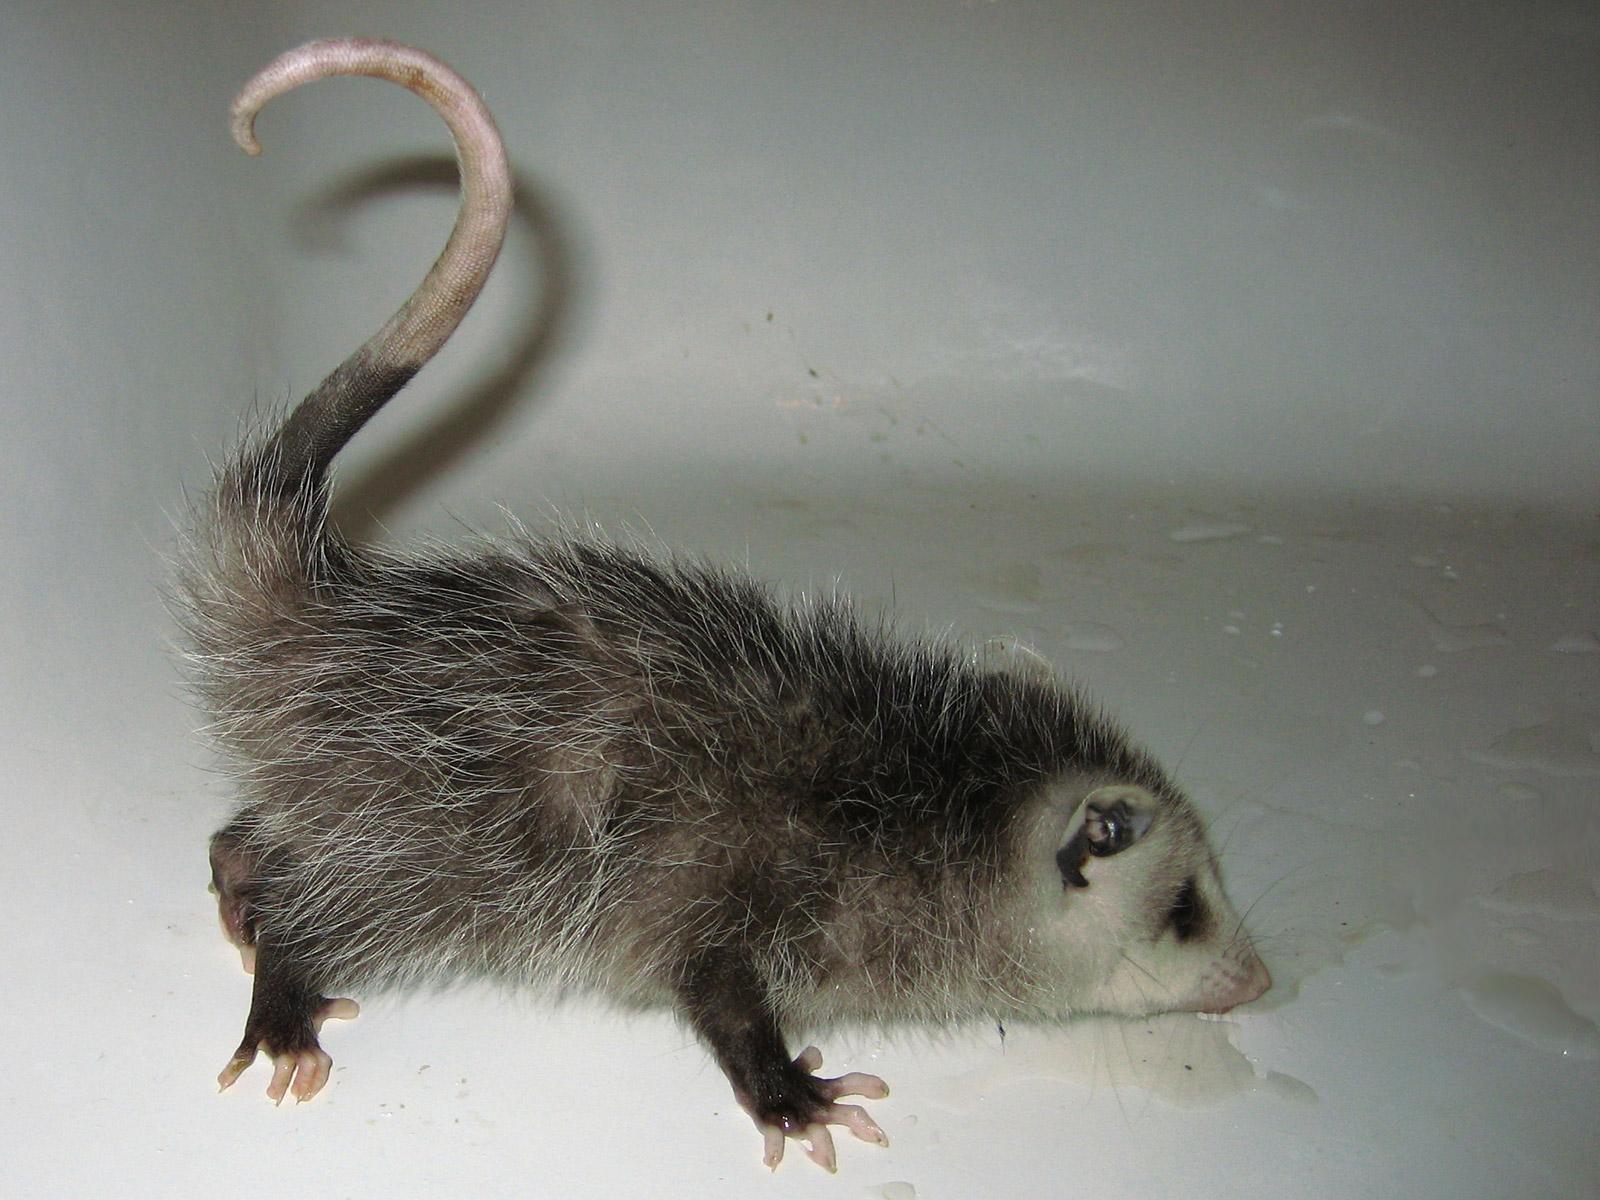 Cute Baby Possums